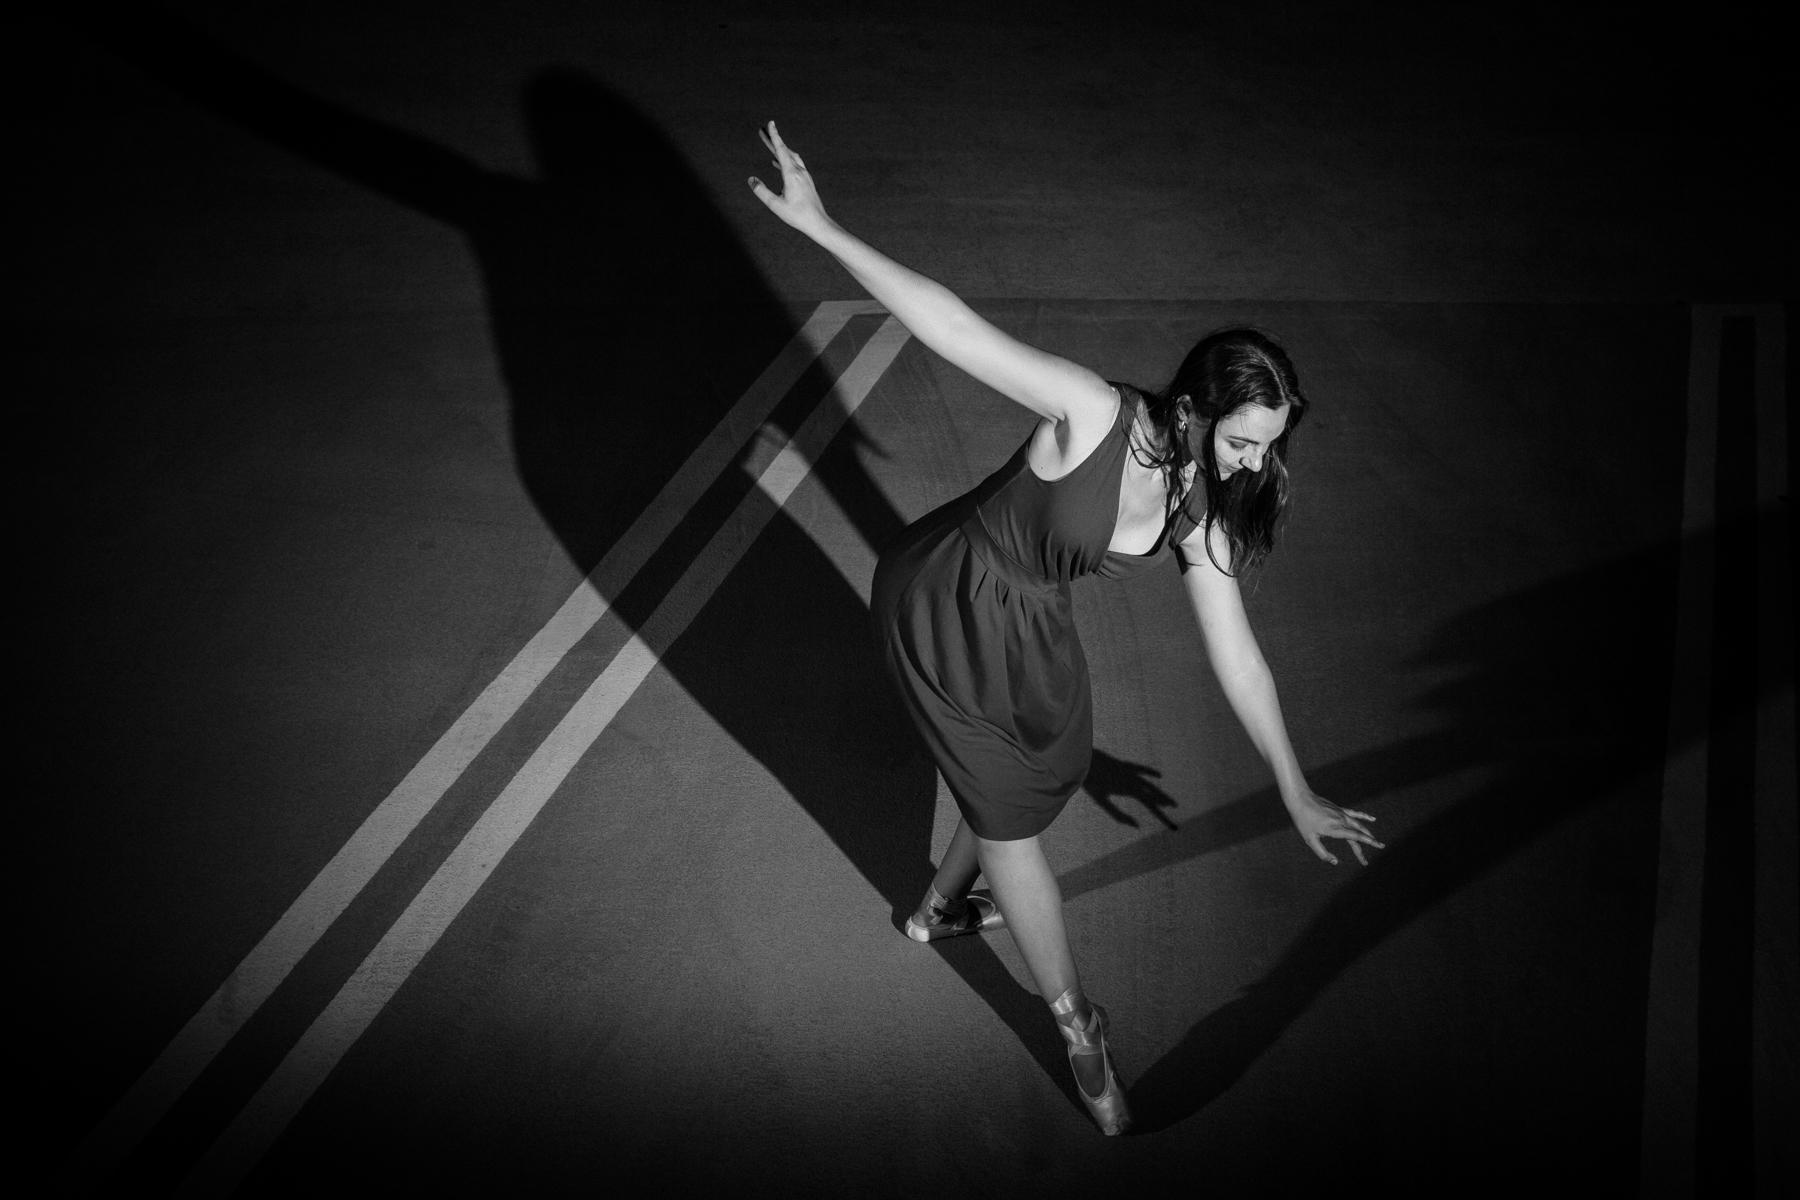 2016_07_28_anne_talkington_durham_dances_ballet_corcoran-97-2.jpg